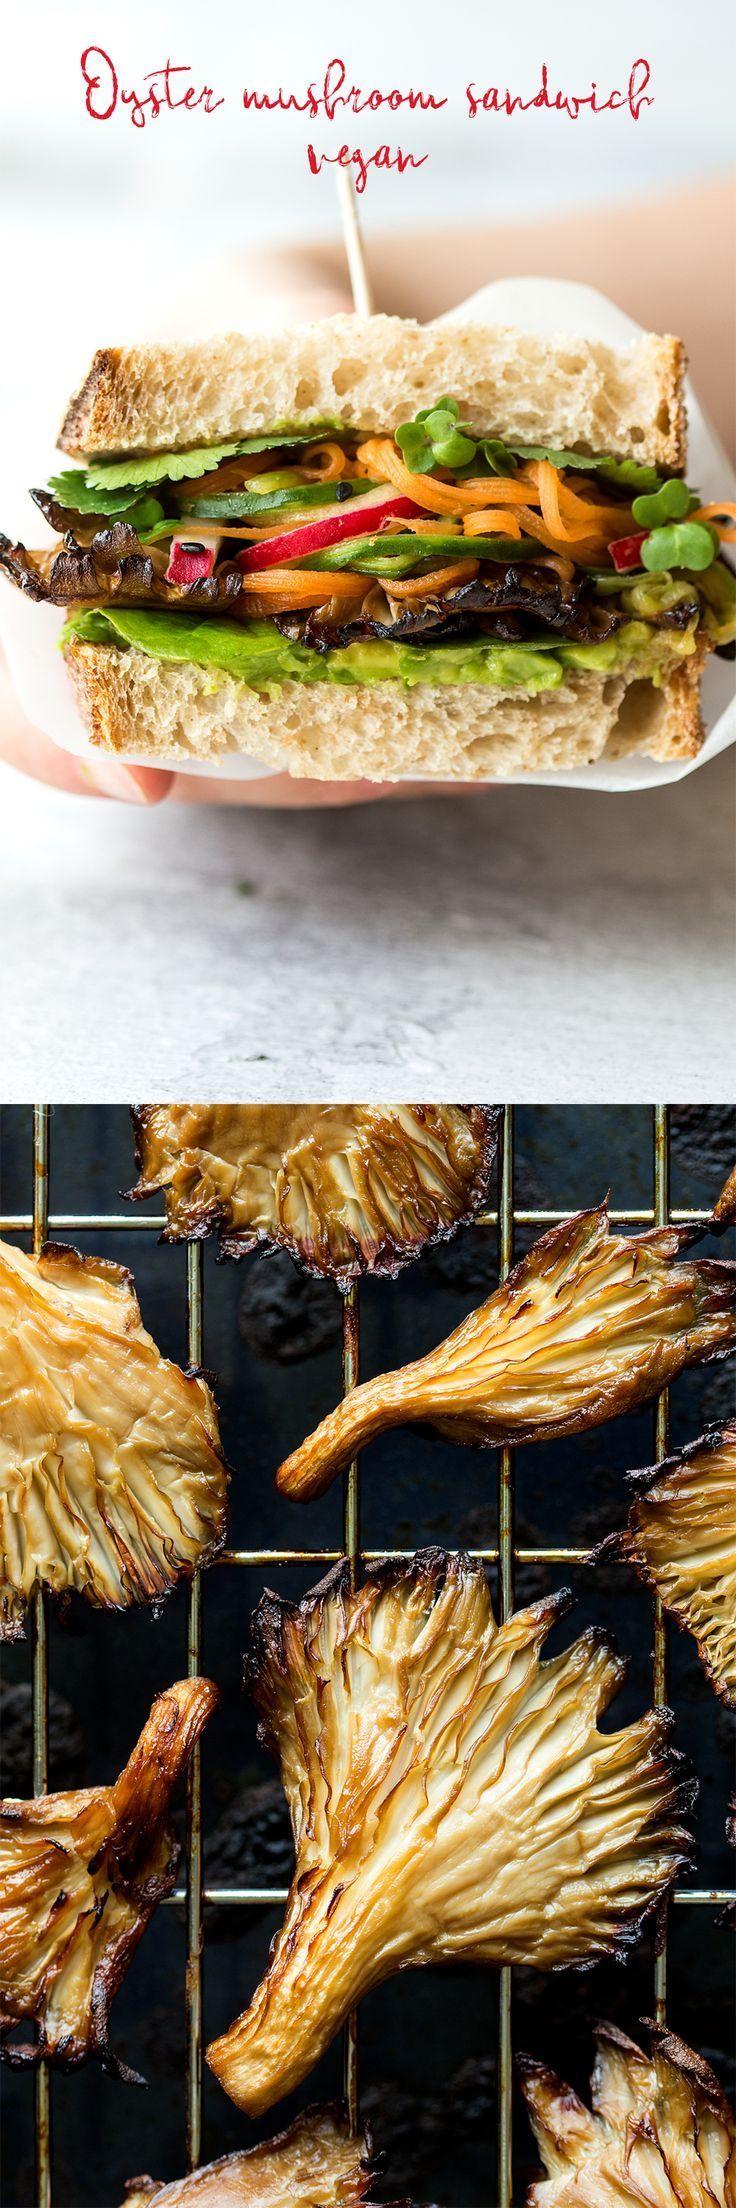 Asian mushroom sandwich Lazy Cat Kitchen Recipe